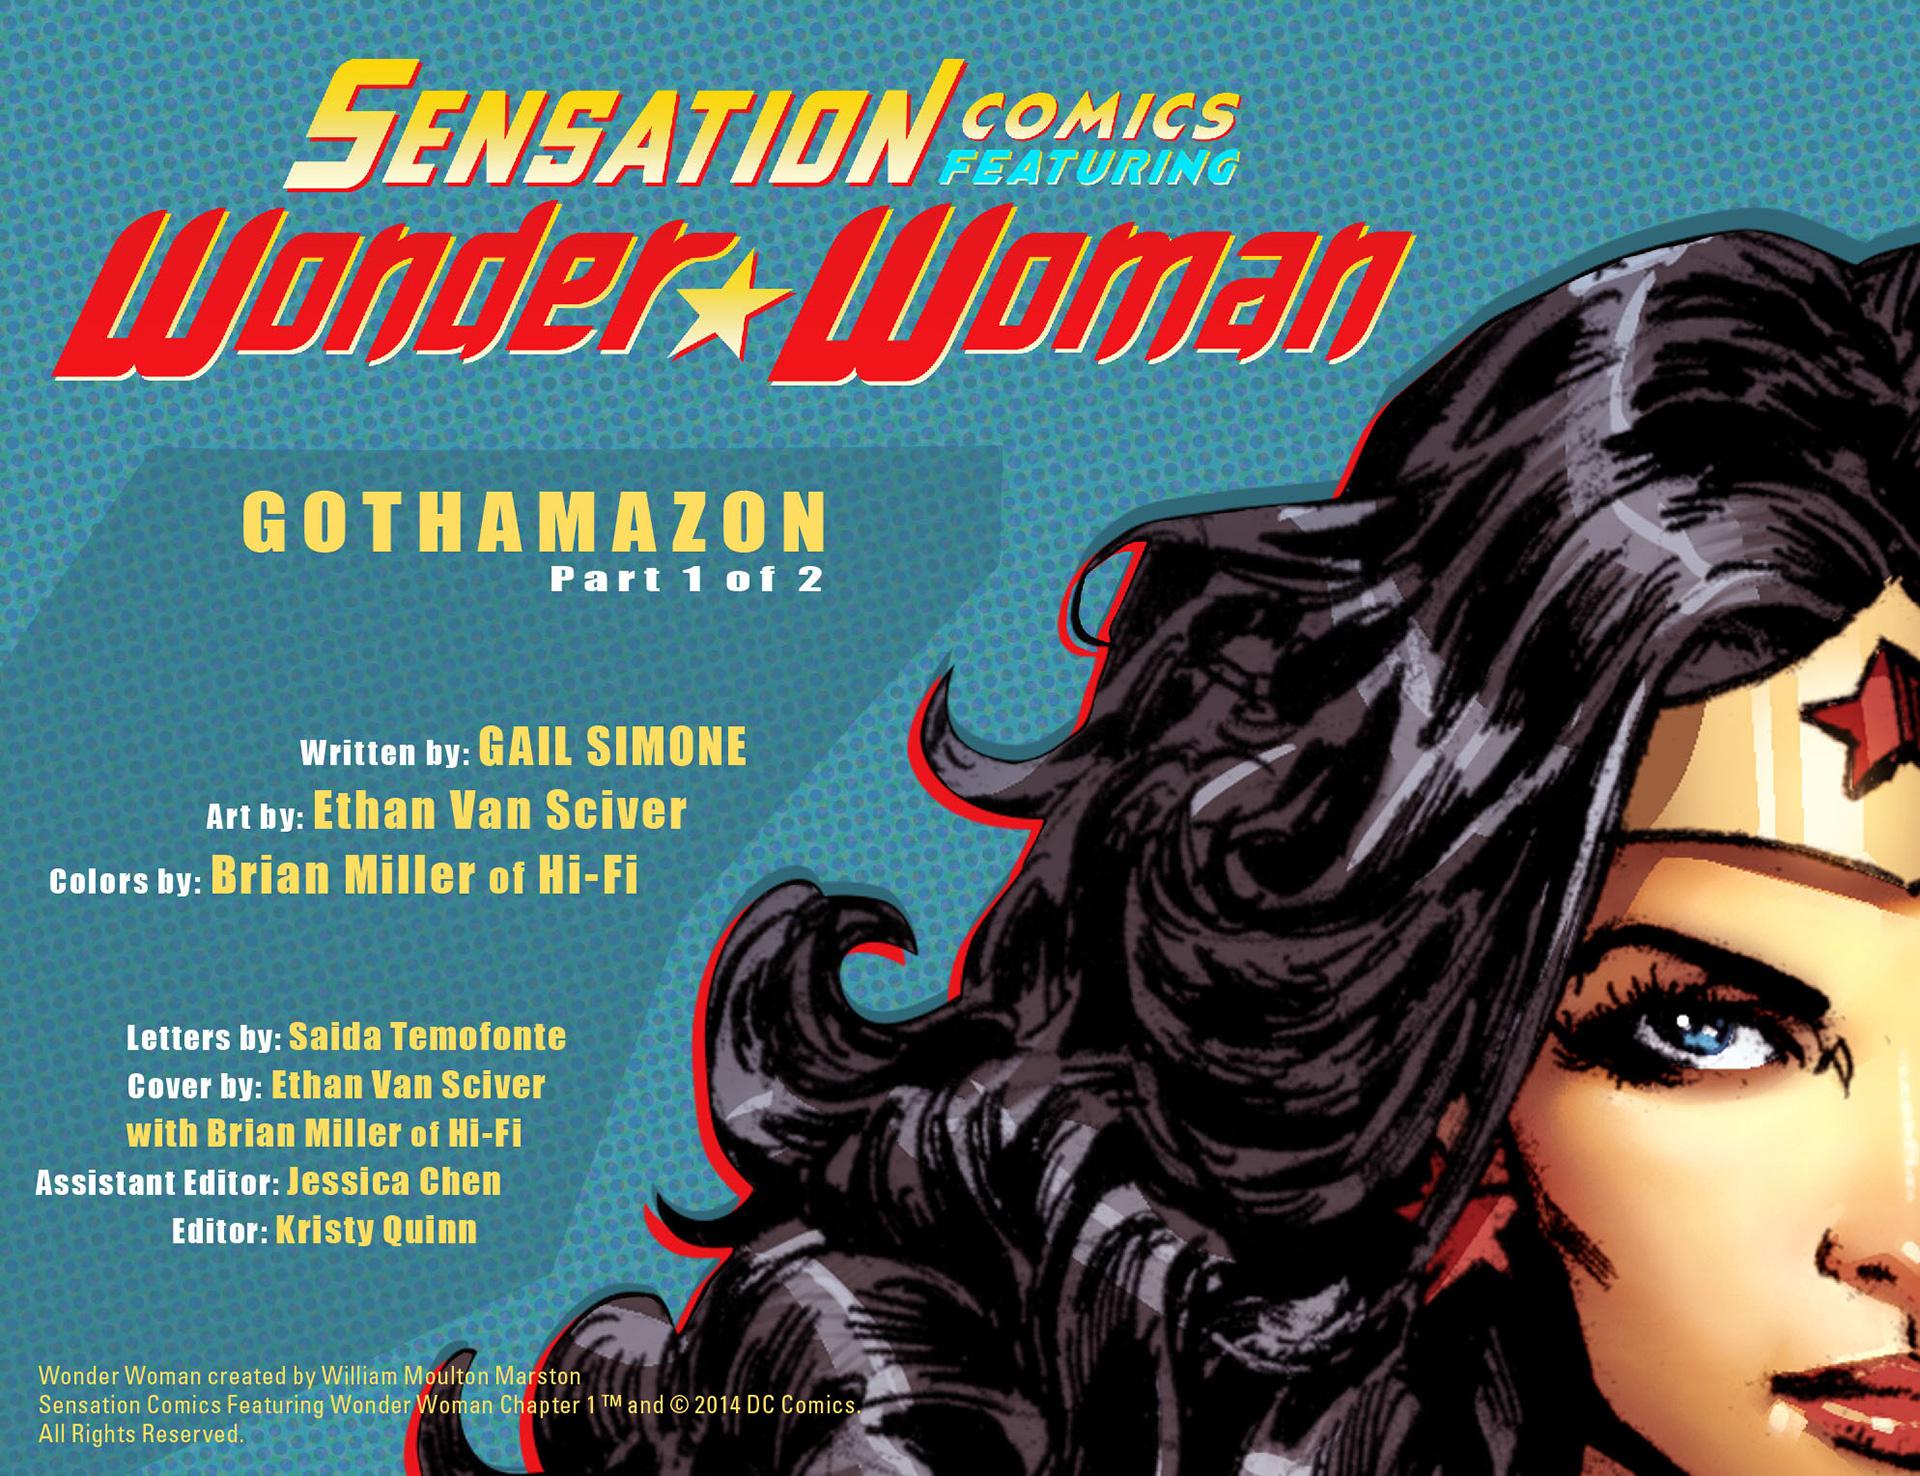 Read online Sensation Comics Featuring Wonder Woman comic -  Issue #1 - 2